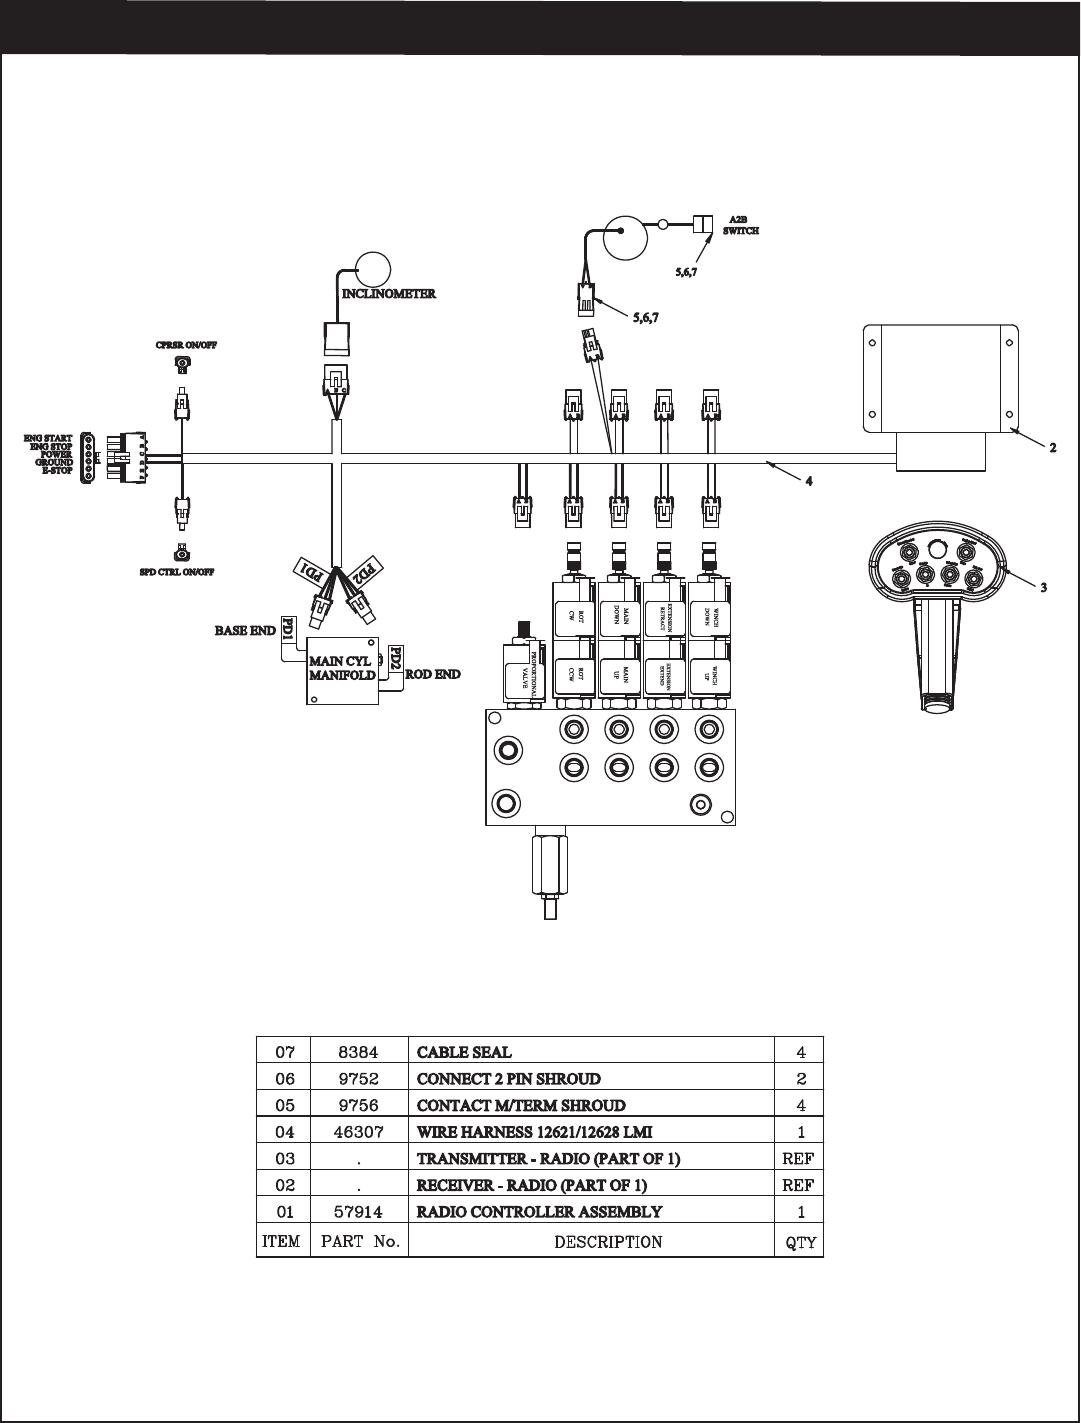 Stellar Industries 5521 Users Manual Telescopic Crane Rm Hoist Wiring Diagram Owners